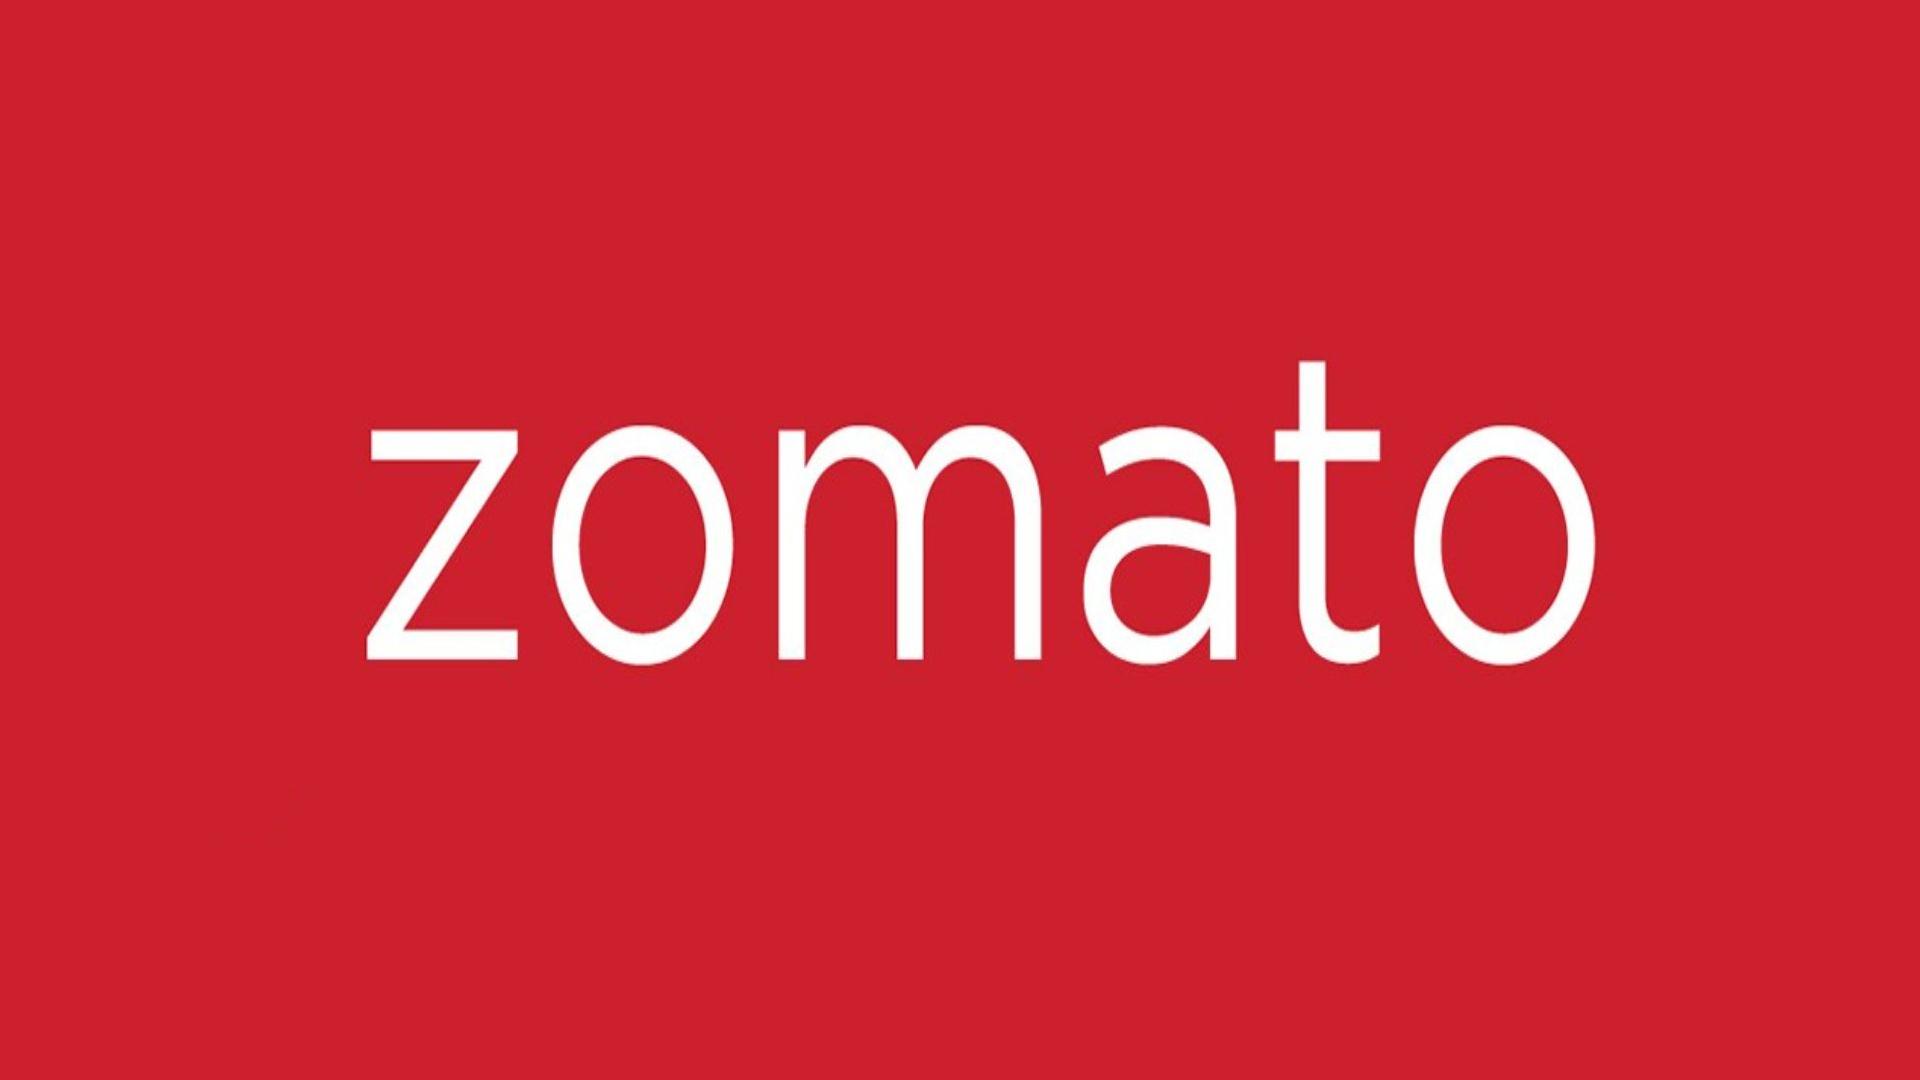 Restaurant Review Sites: Zomato